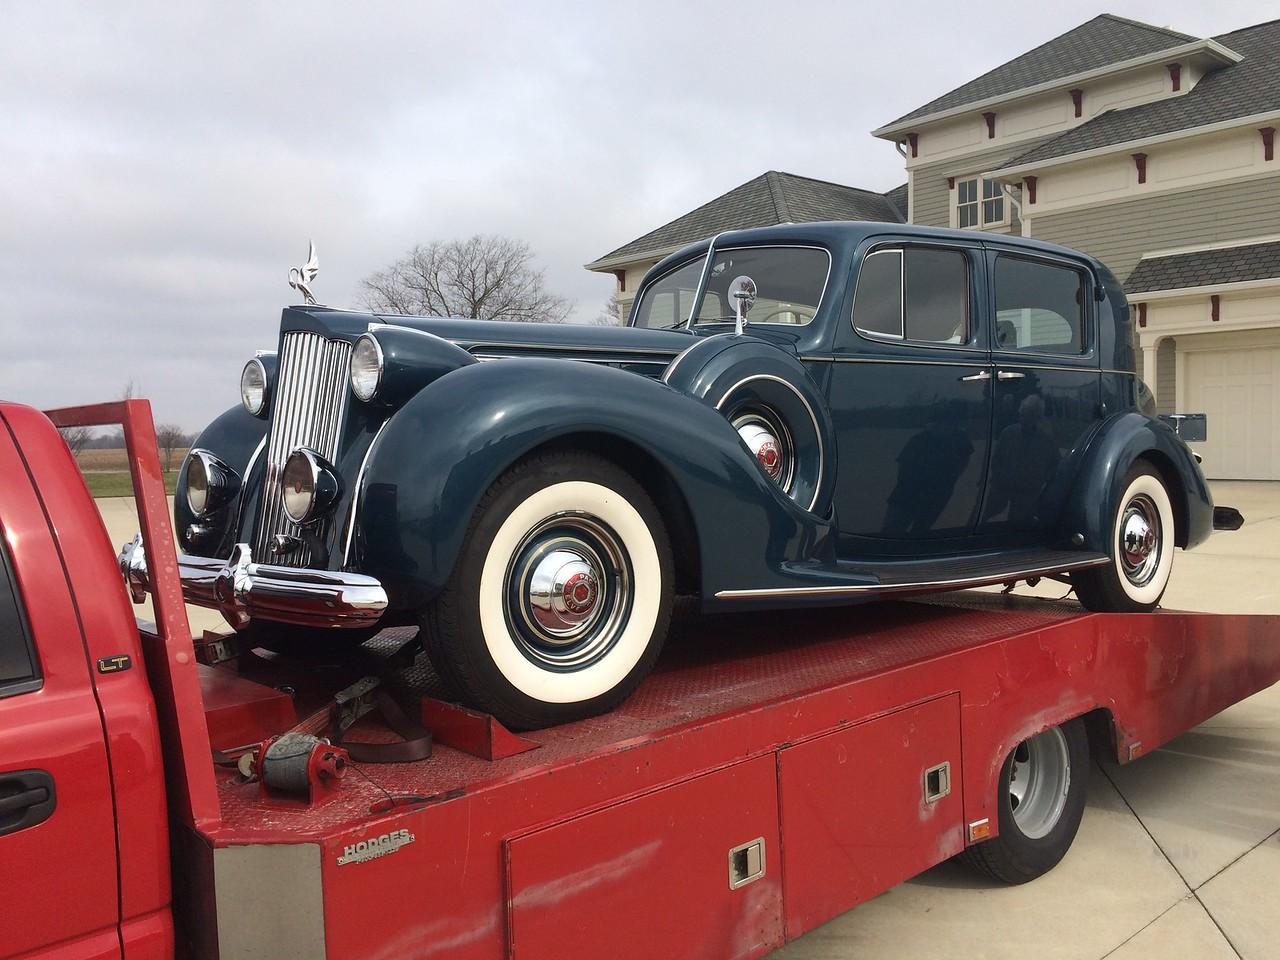 1935 Packard 12 Cylinder Club Sedan (Greensburg, Indiana to Nashville, Tennessee)